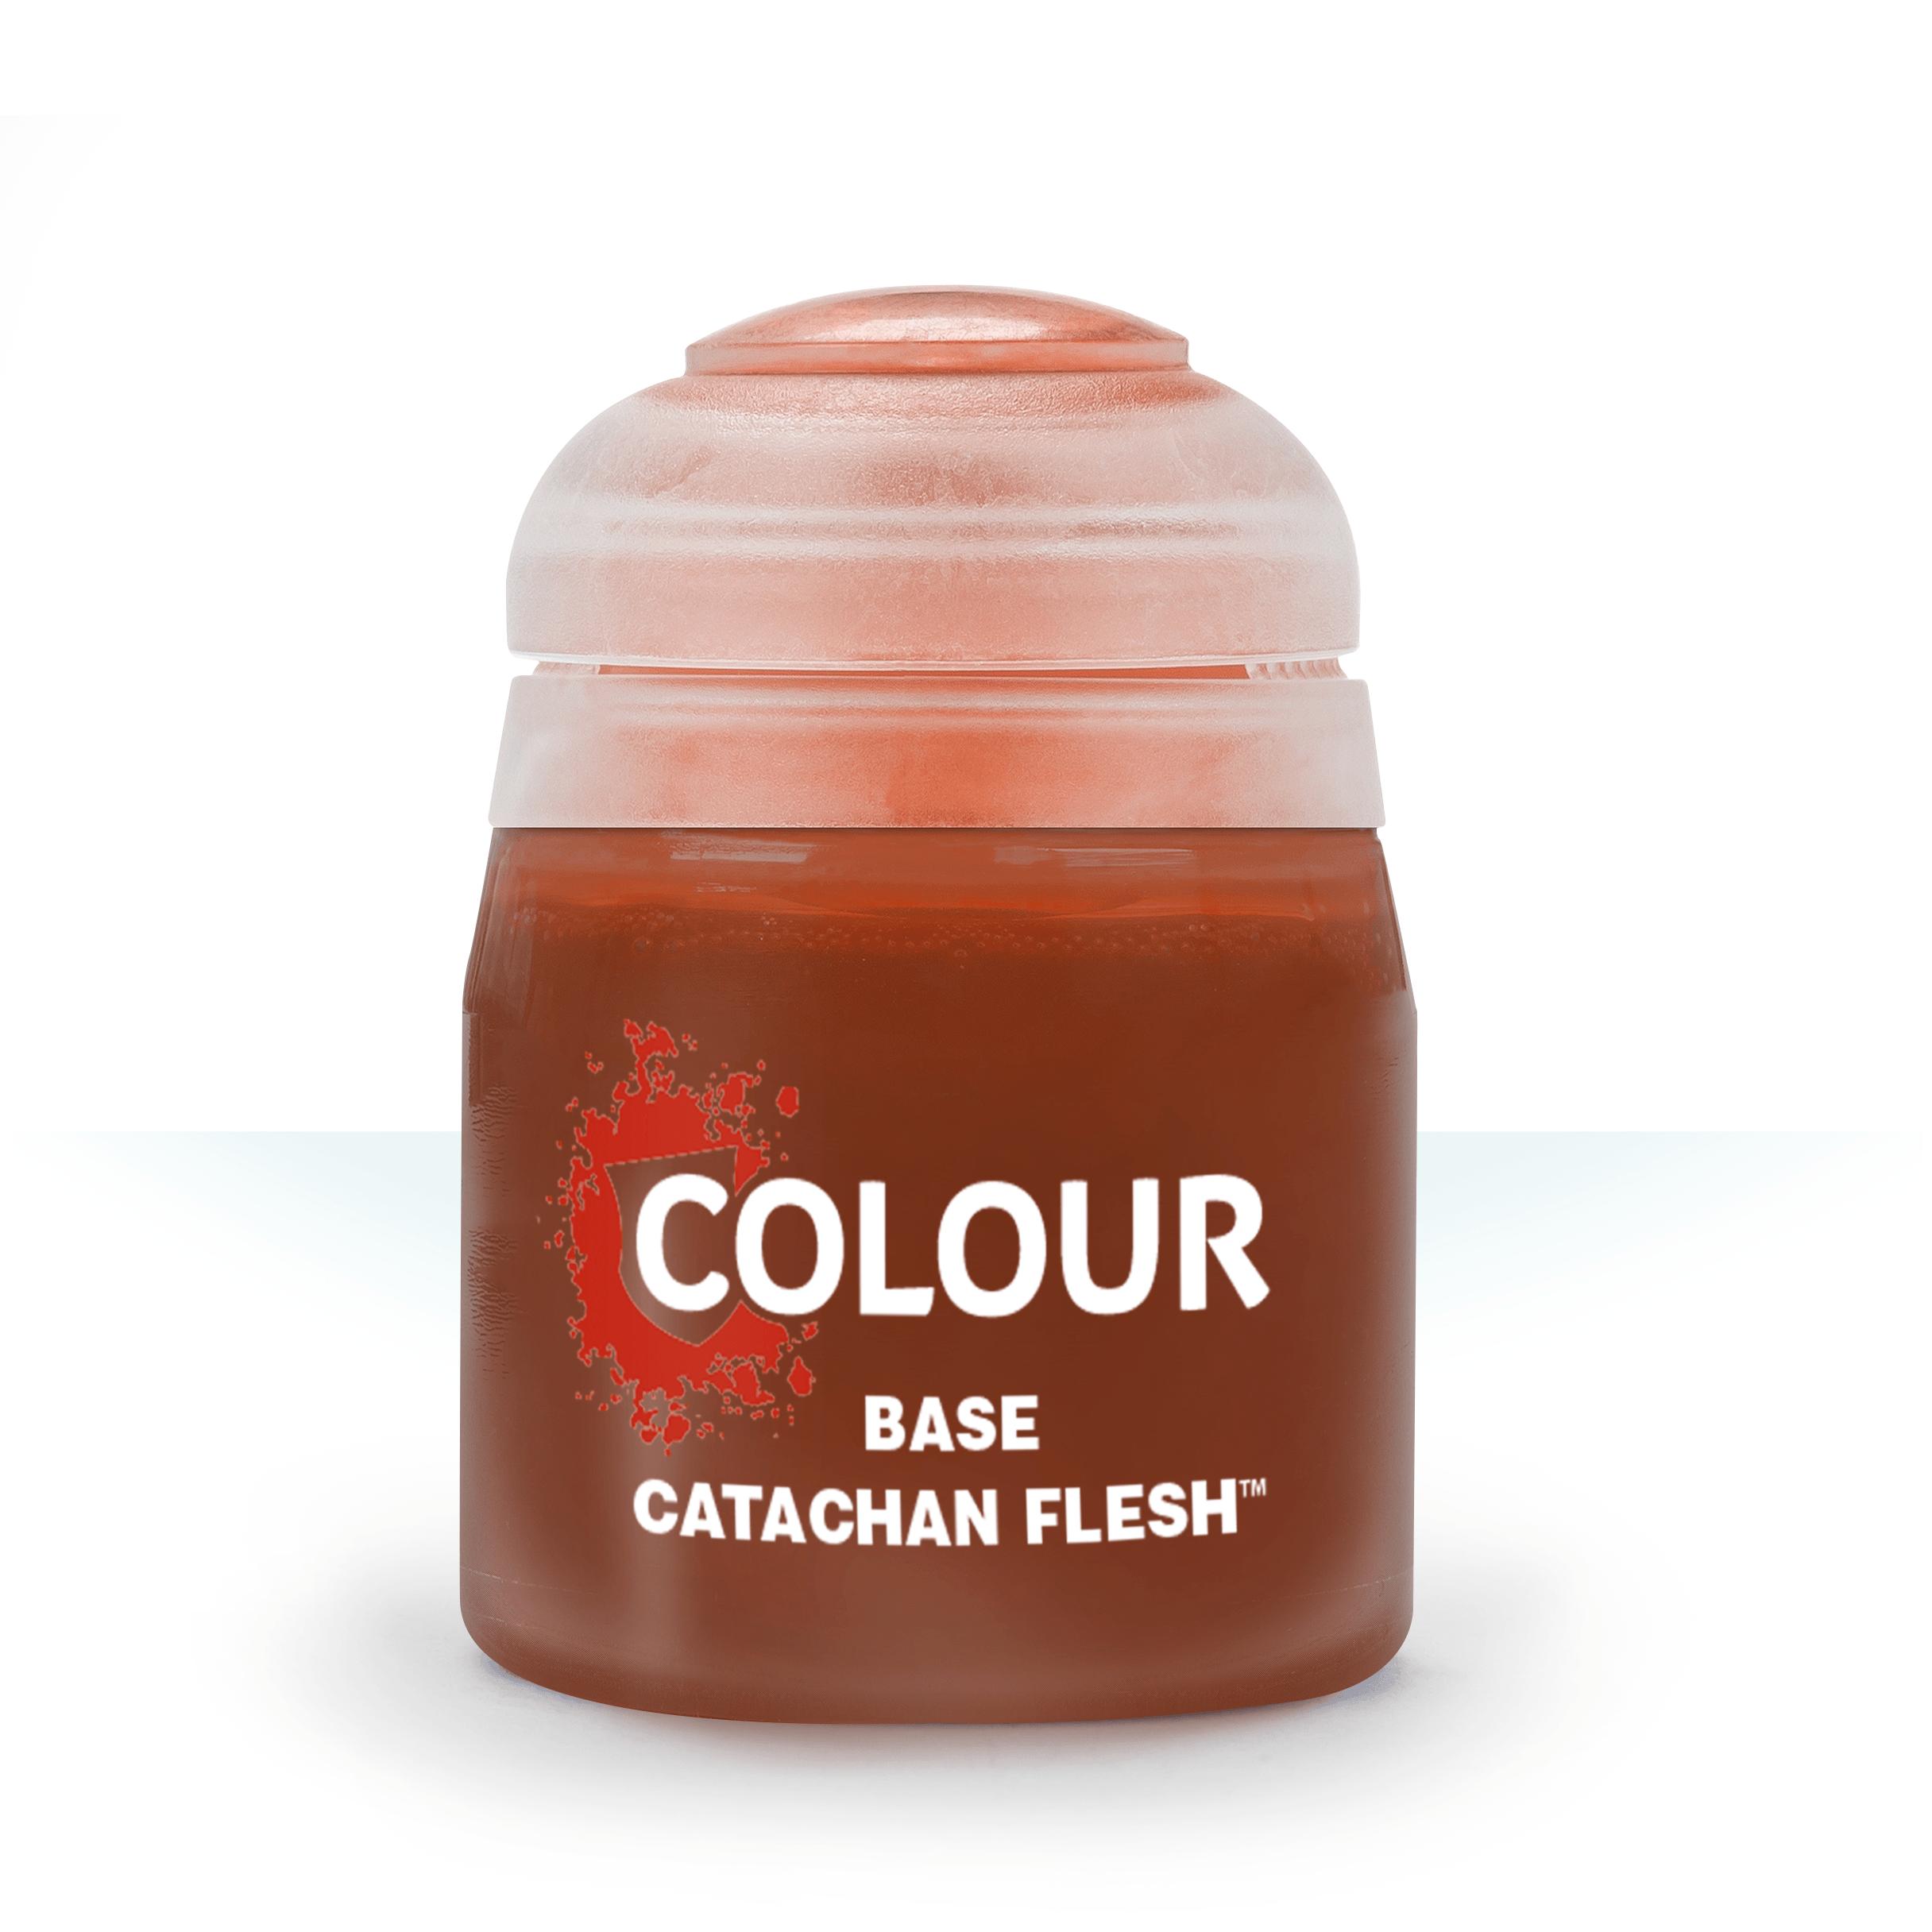 Base Catachan Flesh